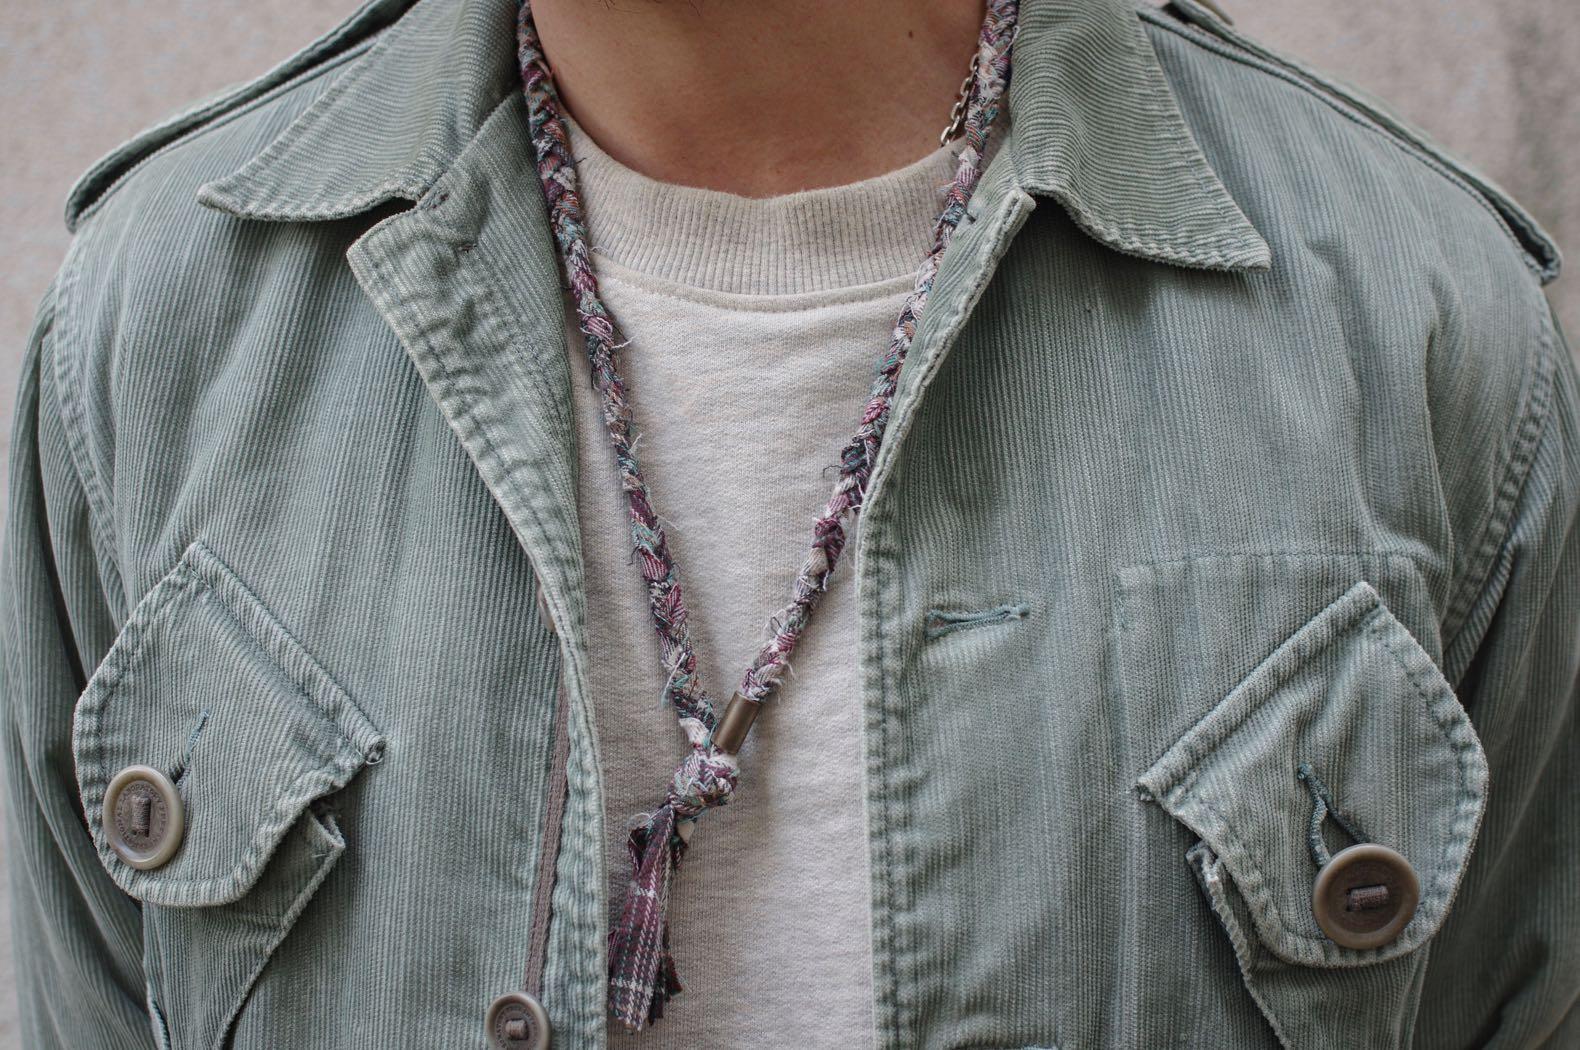 visvim caf combat jacket slub corduroy - borali necklace